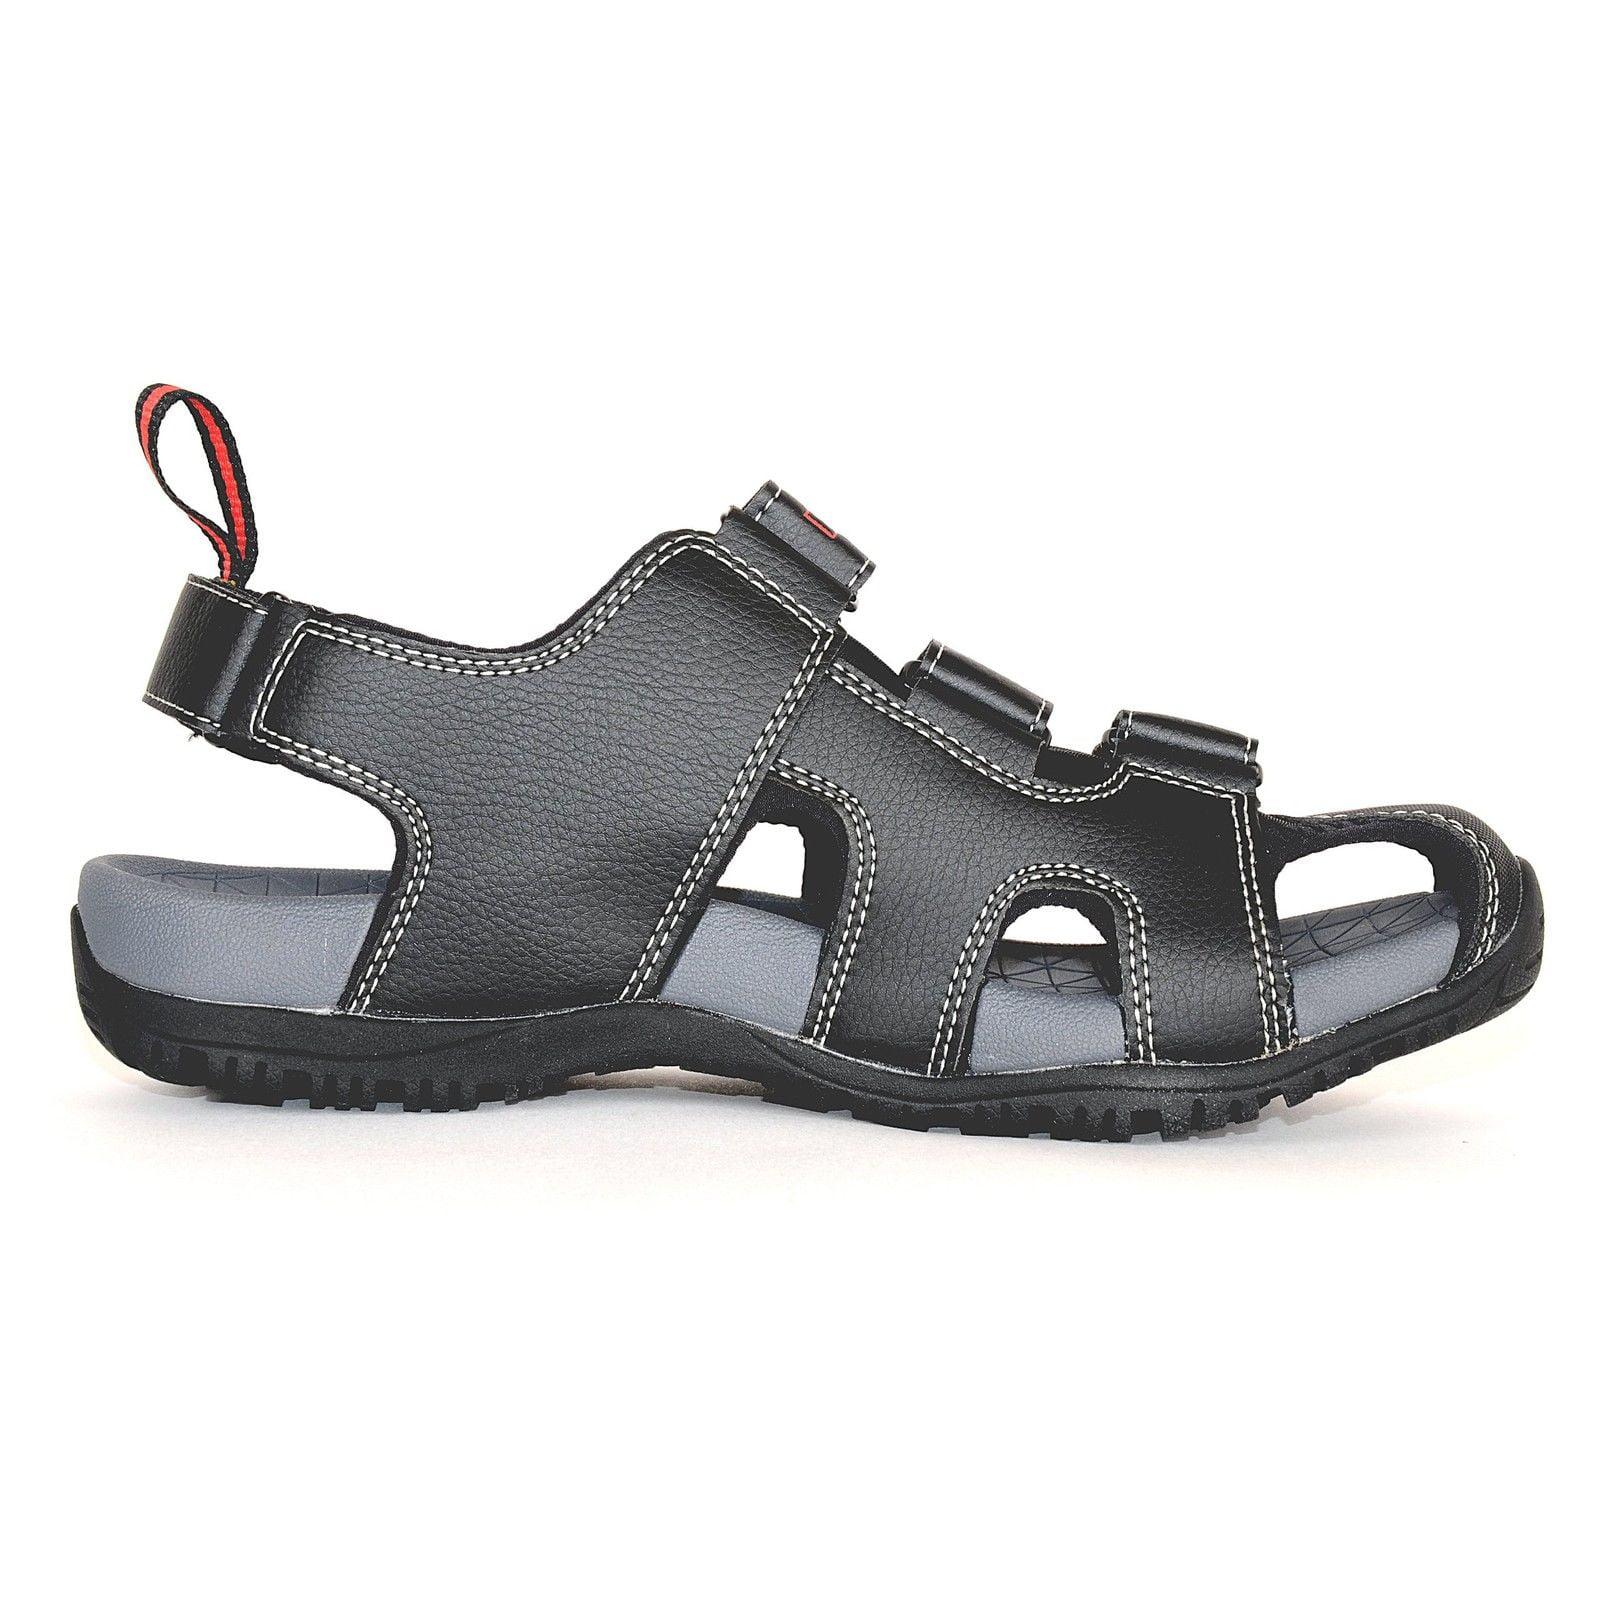 Exustar Ss503 Sandal Shoes Exustar sandal Ss503 47-48 Bk